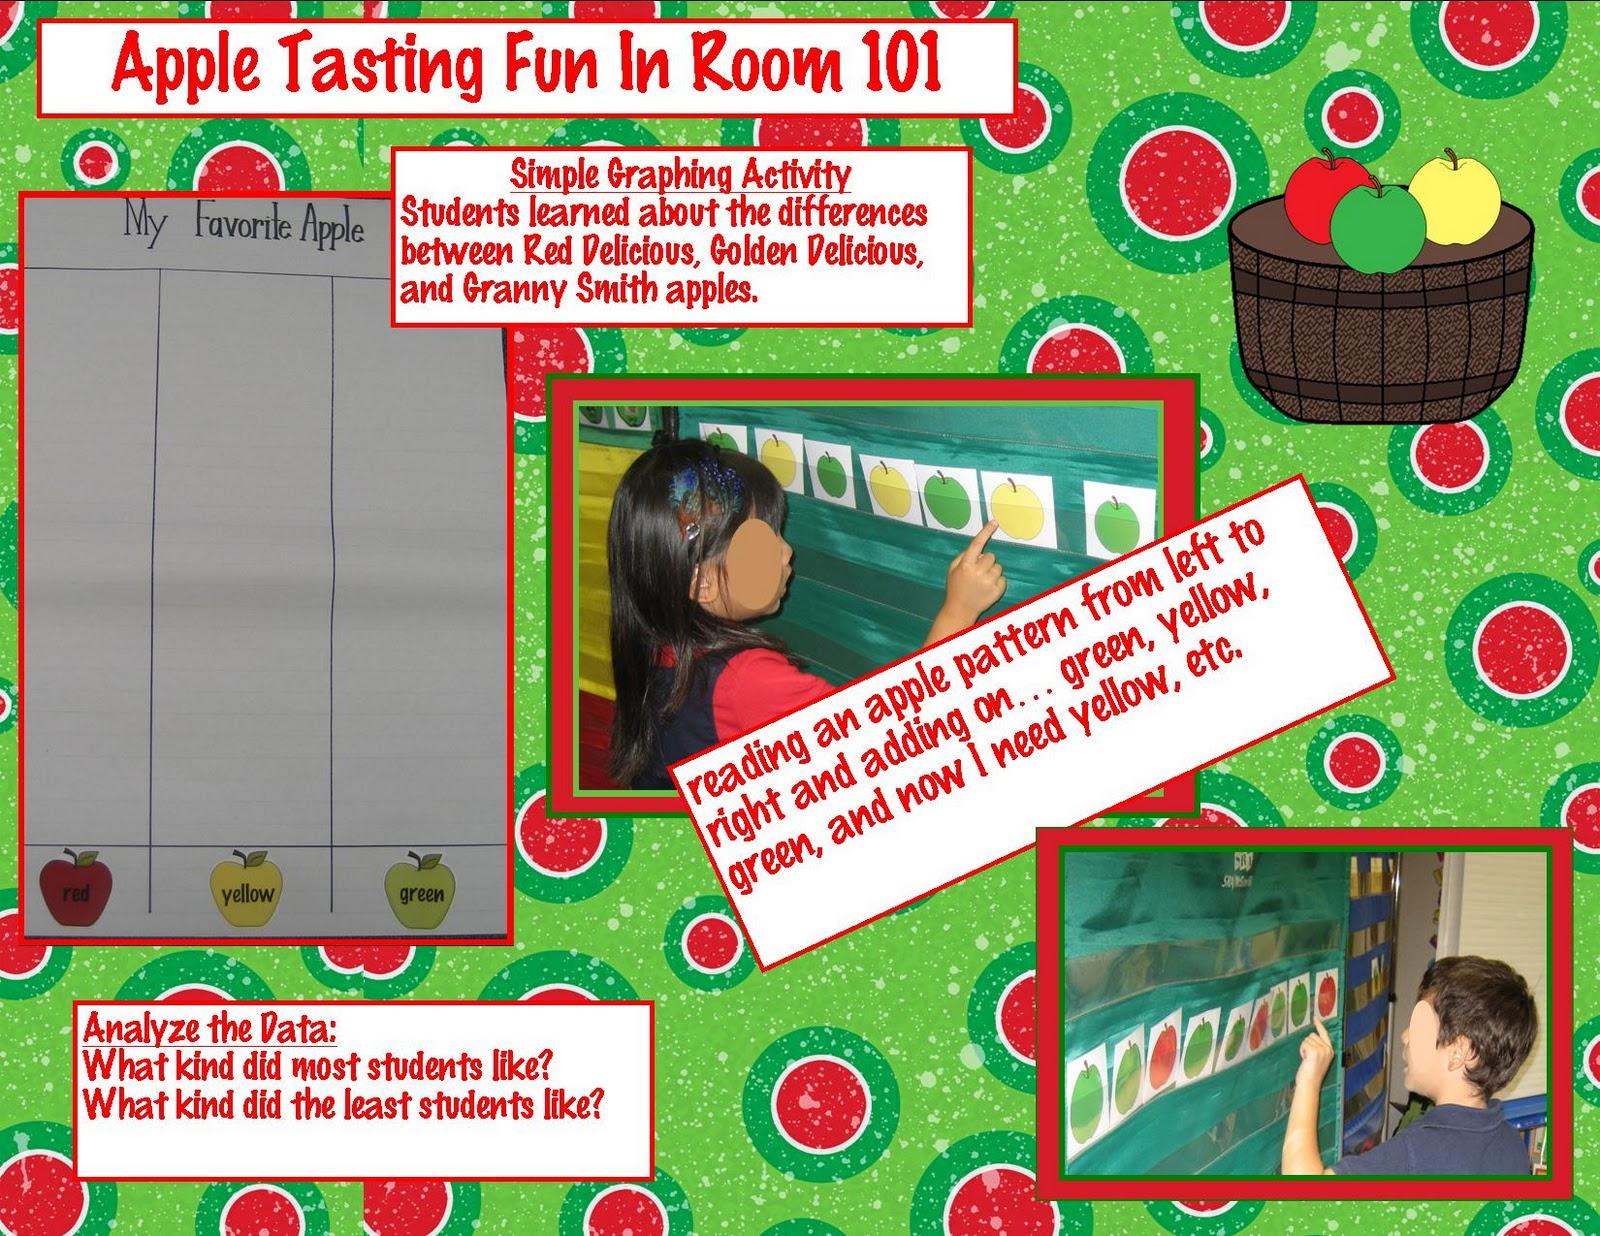 Kindergarten Crayons Apple Tasting Fun